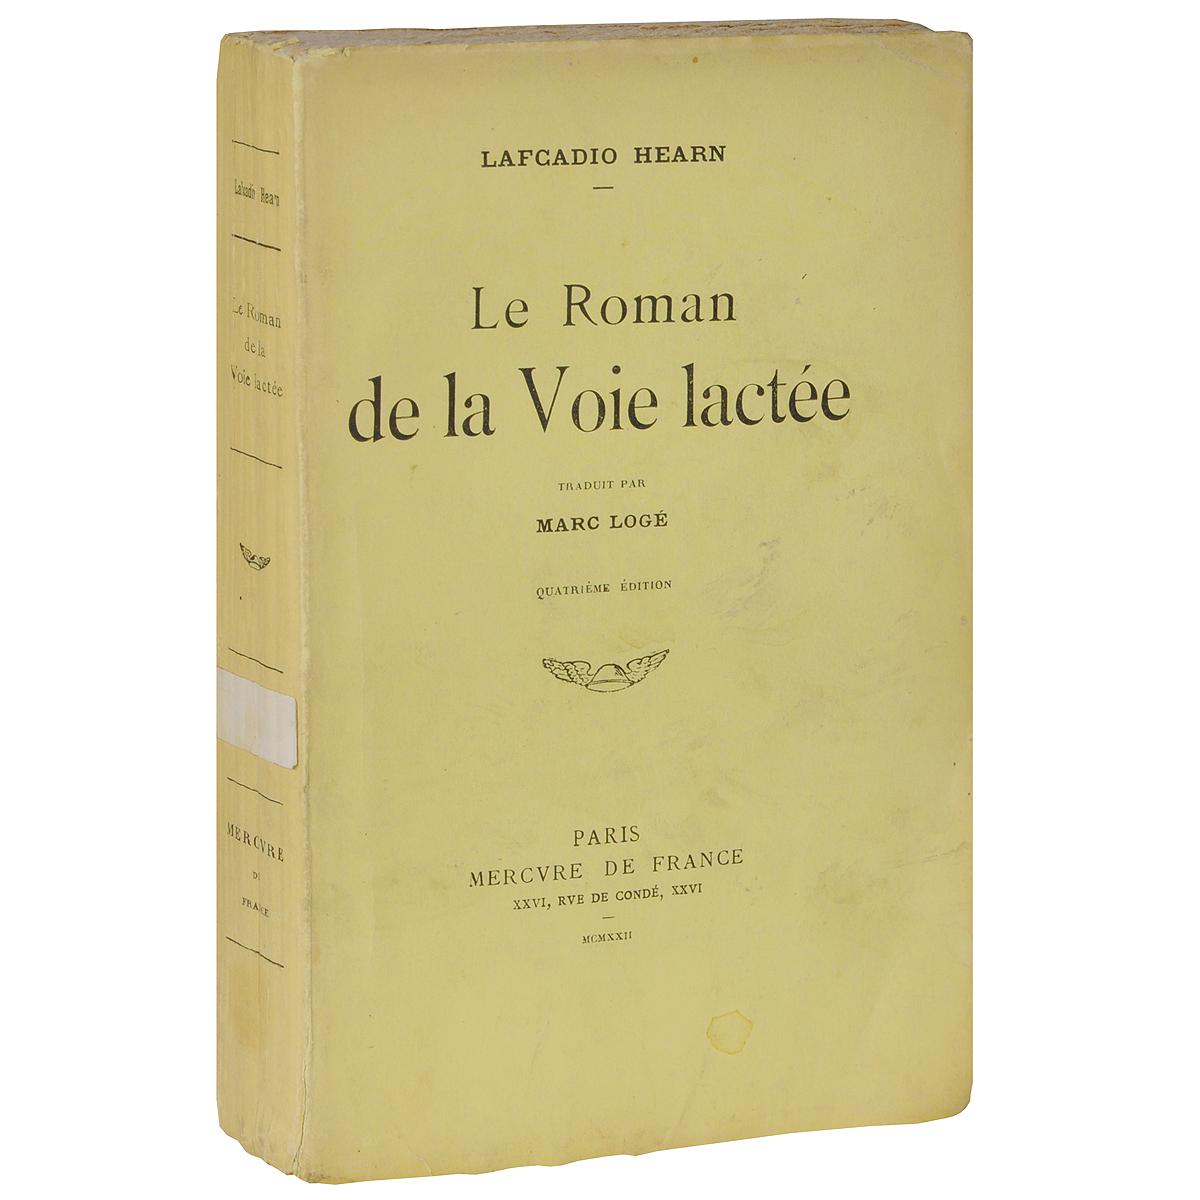 Le Roman de la Voie lacteeОС27728Mercvre de France, переплет: мягкий, формат: уменьшенный. Предлагаем вашему вниманию книгу LE ROMAN DE LA VOIE LACTEE (Роман о Млечном Пути). Задняя часть обложки испачкана.